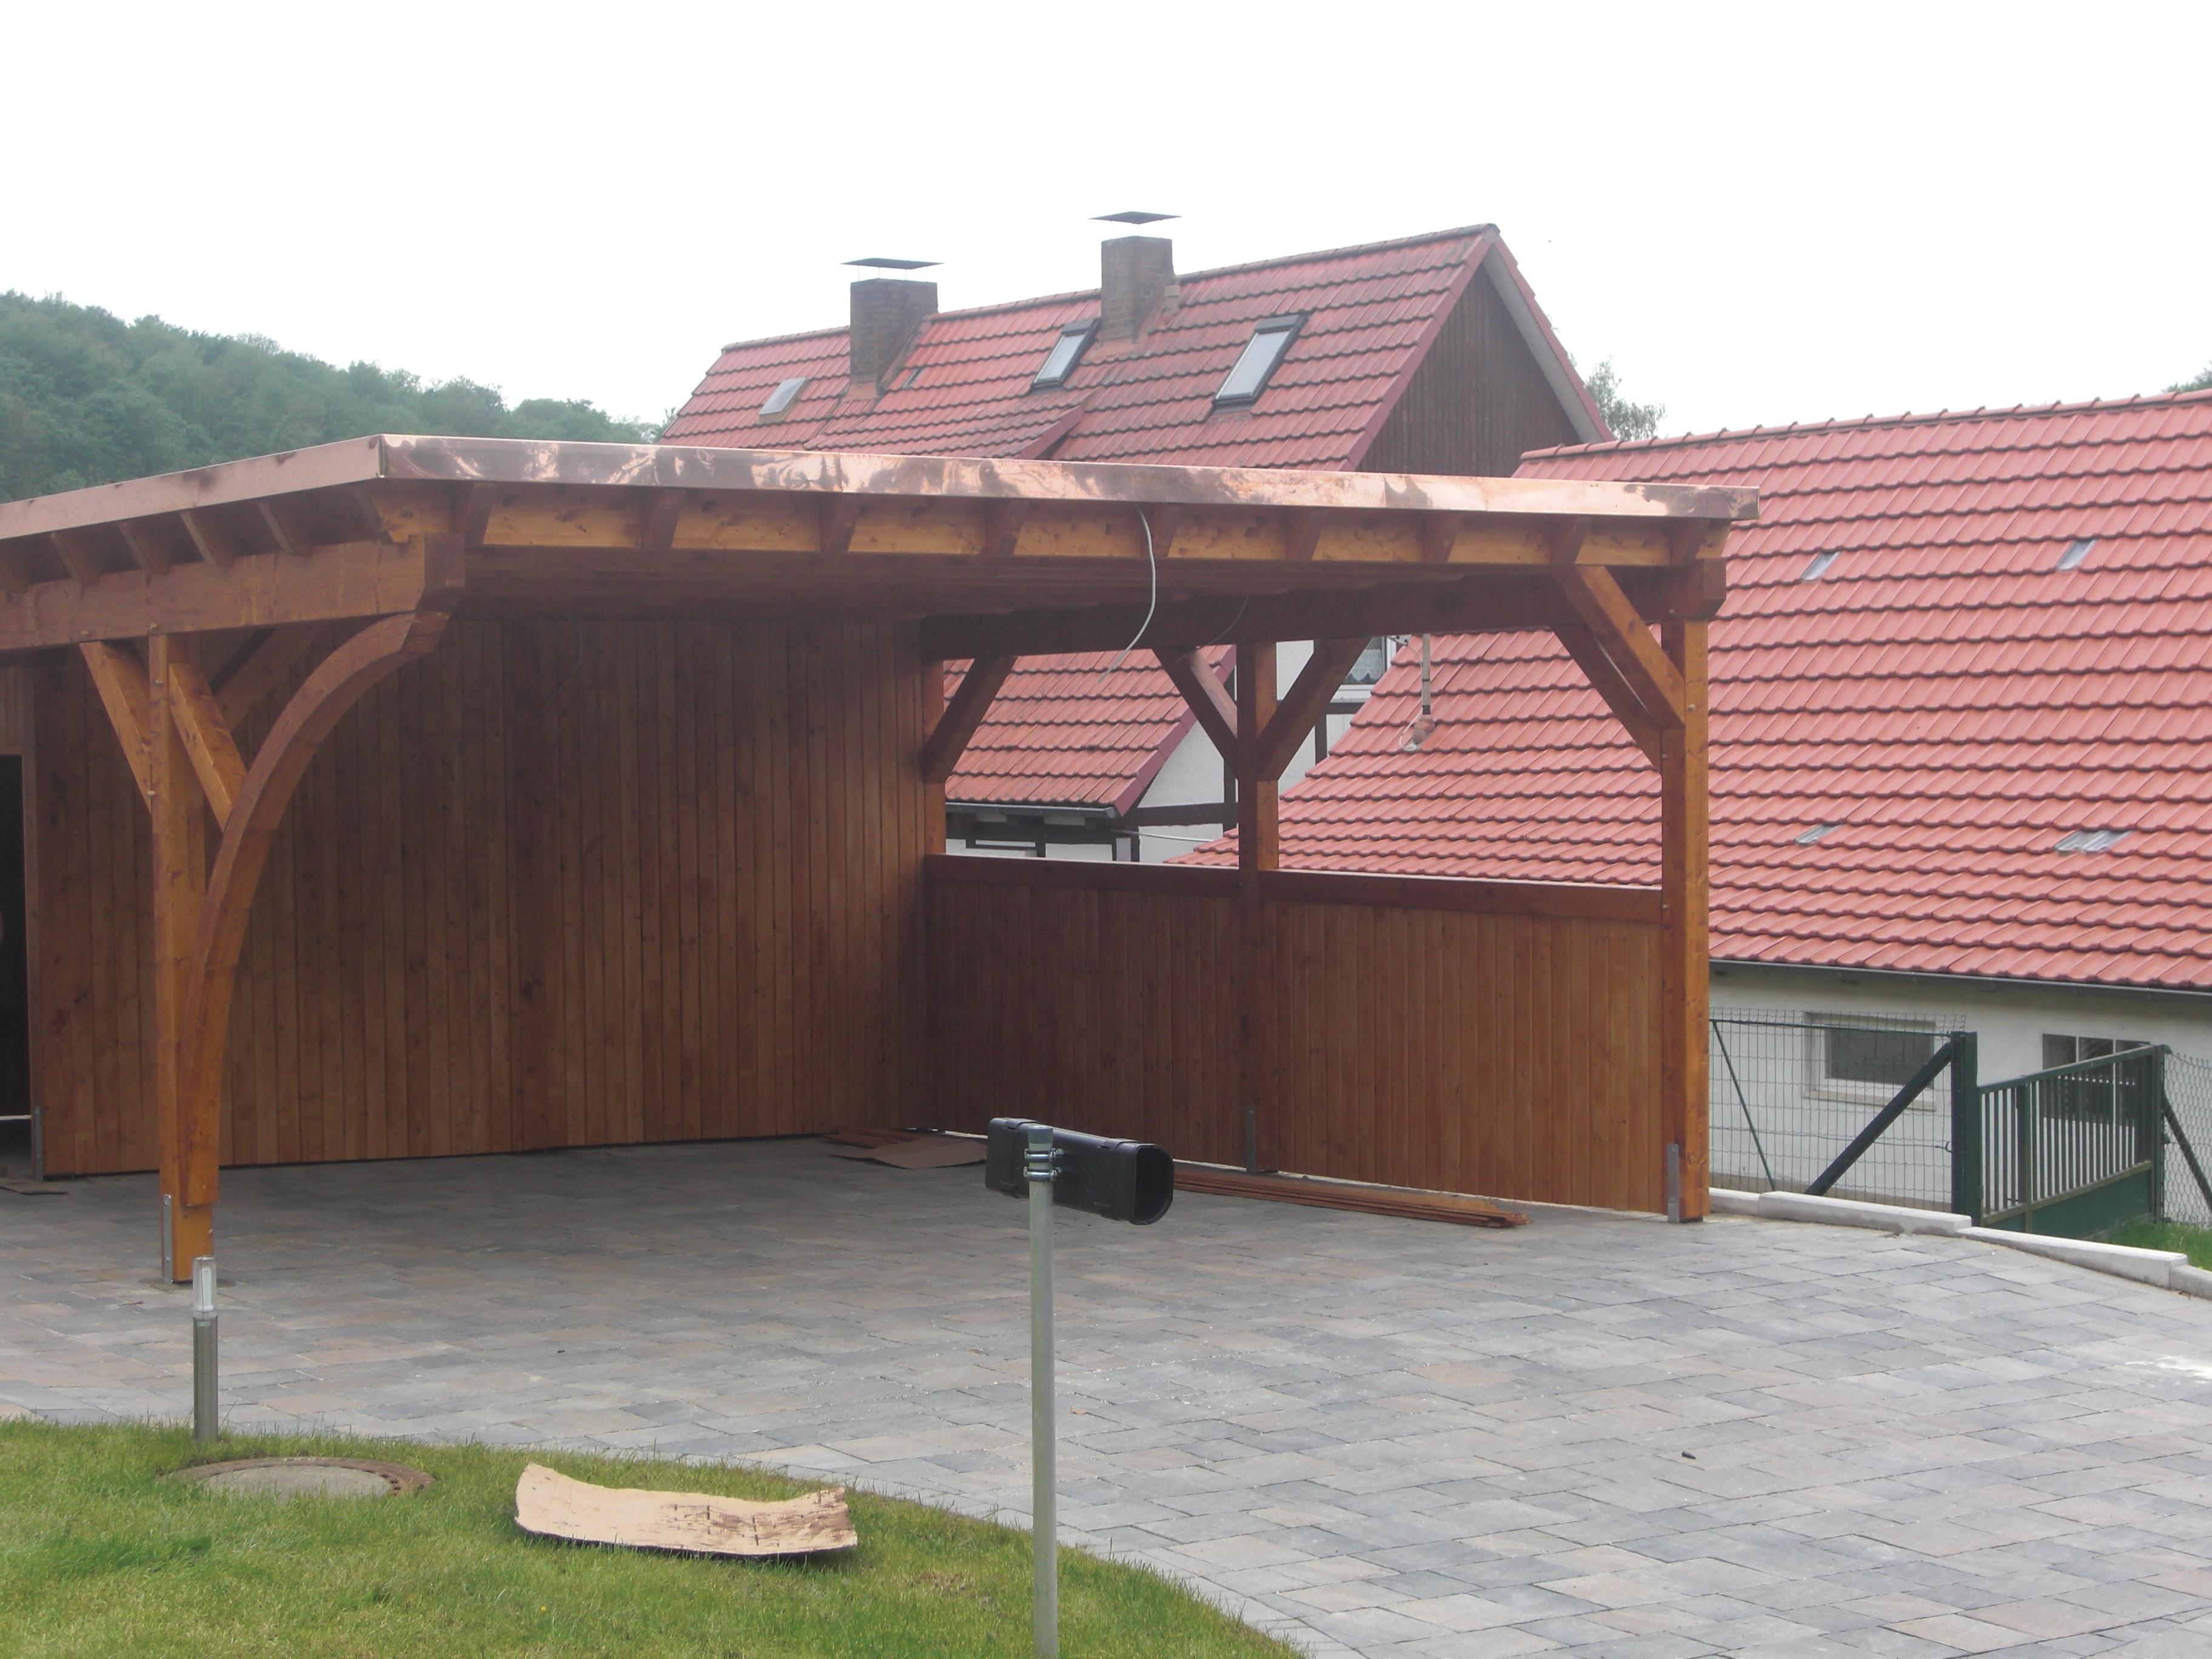 pultdach flachdach carport berlin brandenburg